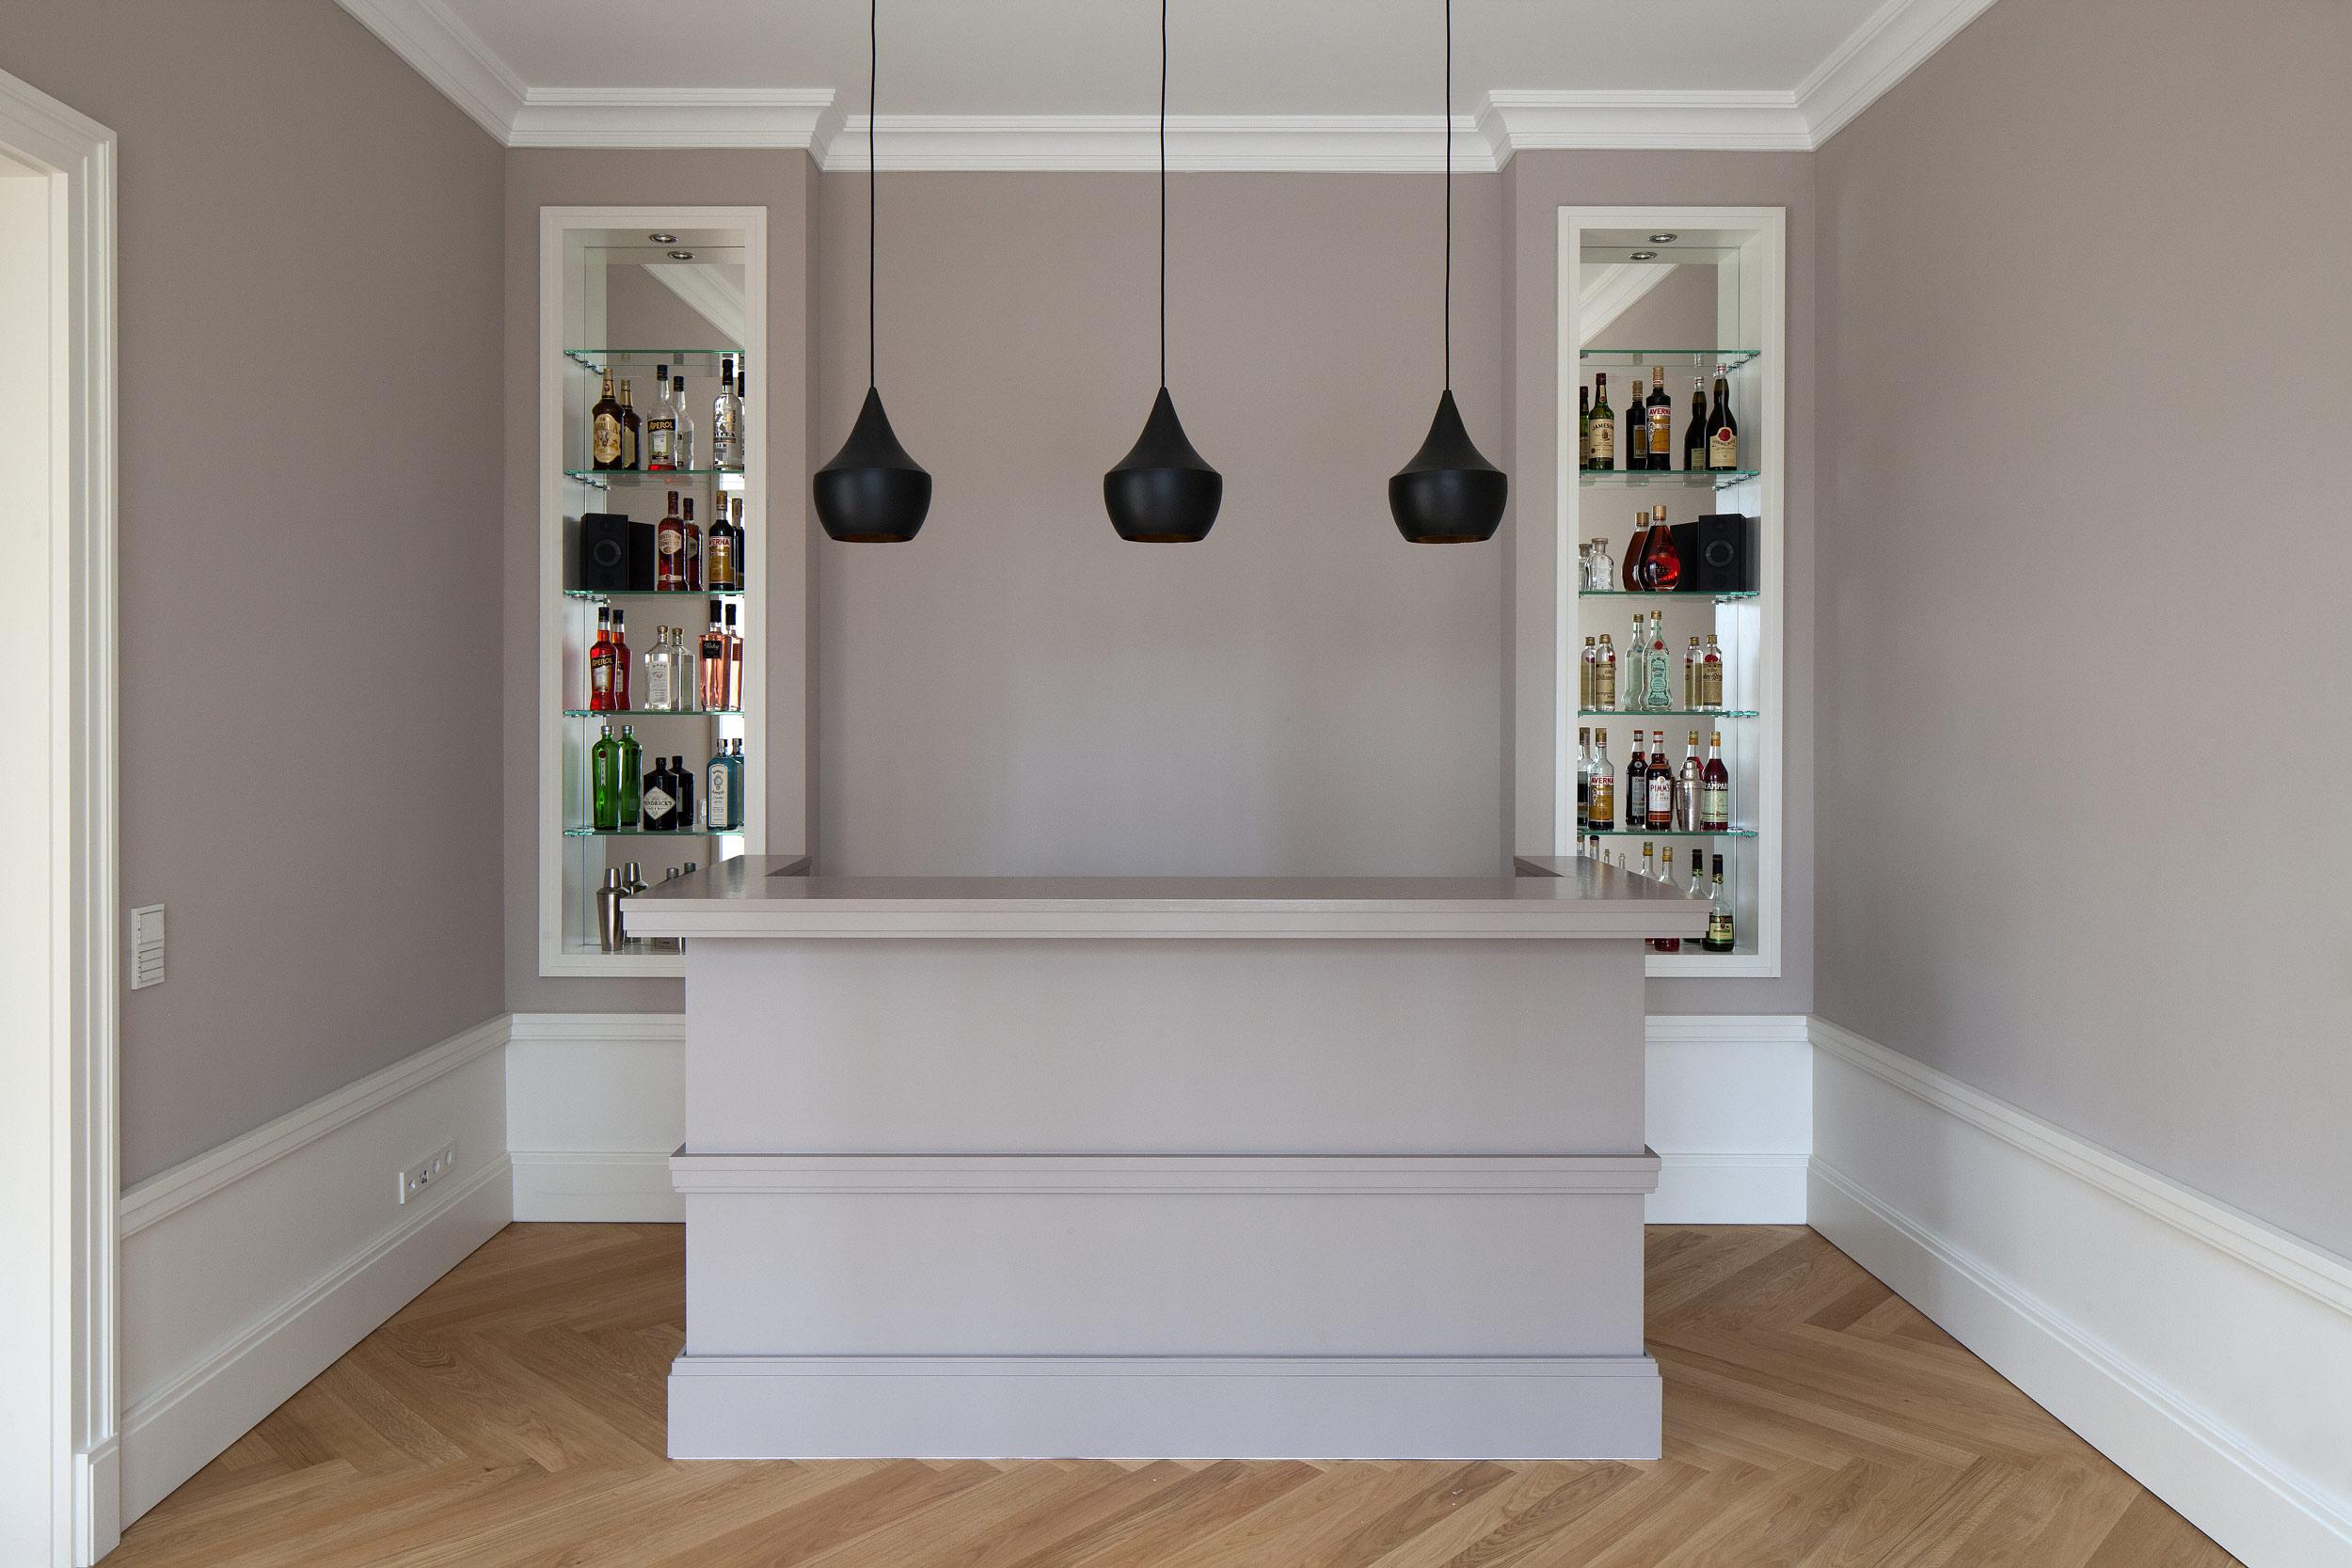 mut zur symmetrie neubau klassizistische villa cg. Black Bedroom Furniture Sets. Home Design Ideas